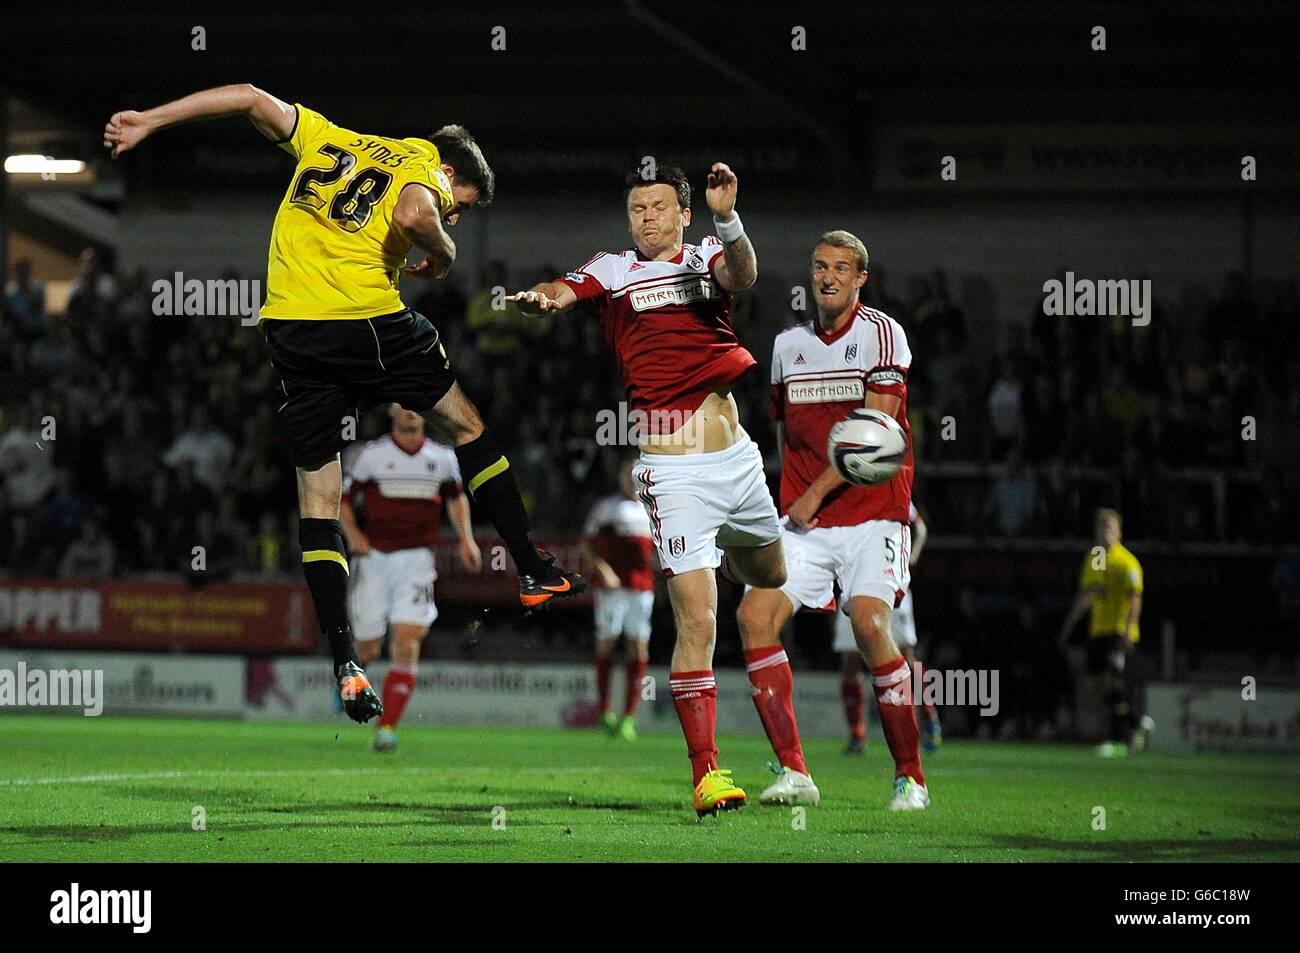 discreción Esplendor Samuel  Soccer - Capital One Cup - Second Round - Burton Albion v Fulham Stock  Photo - Alamy